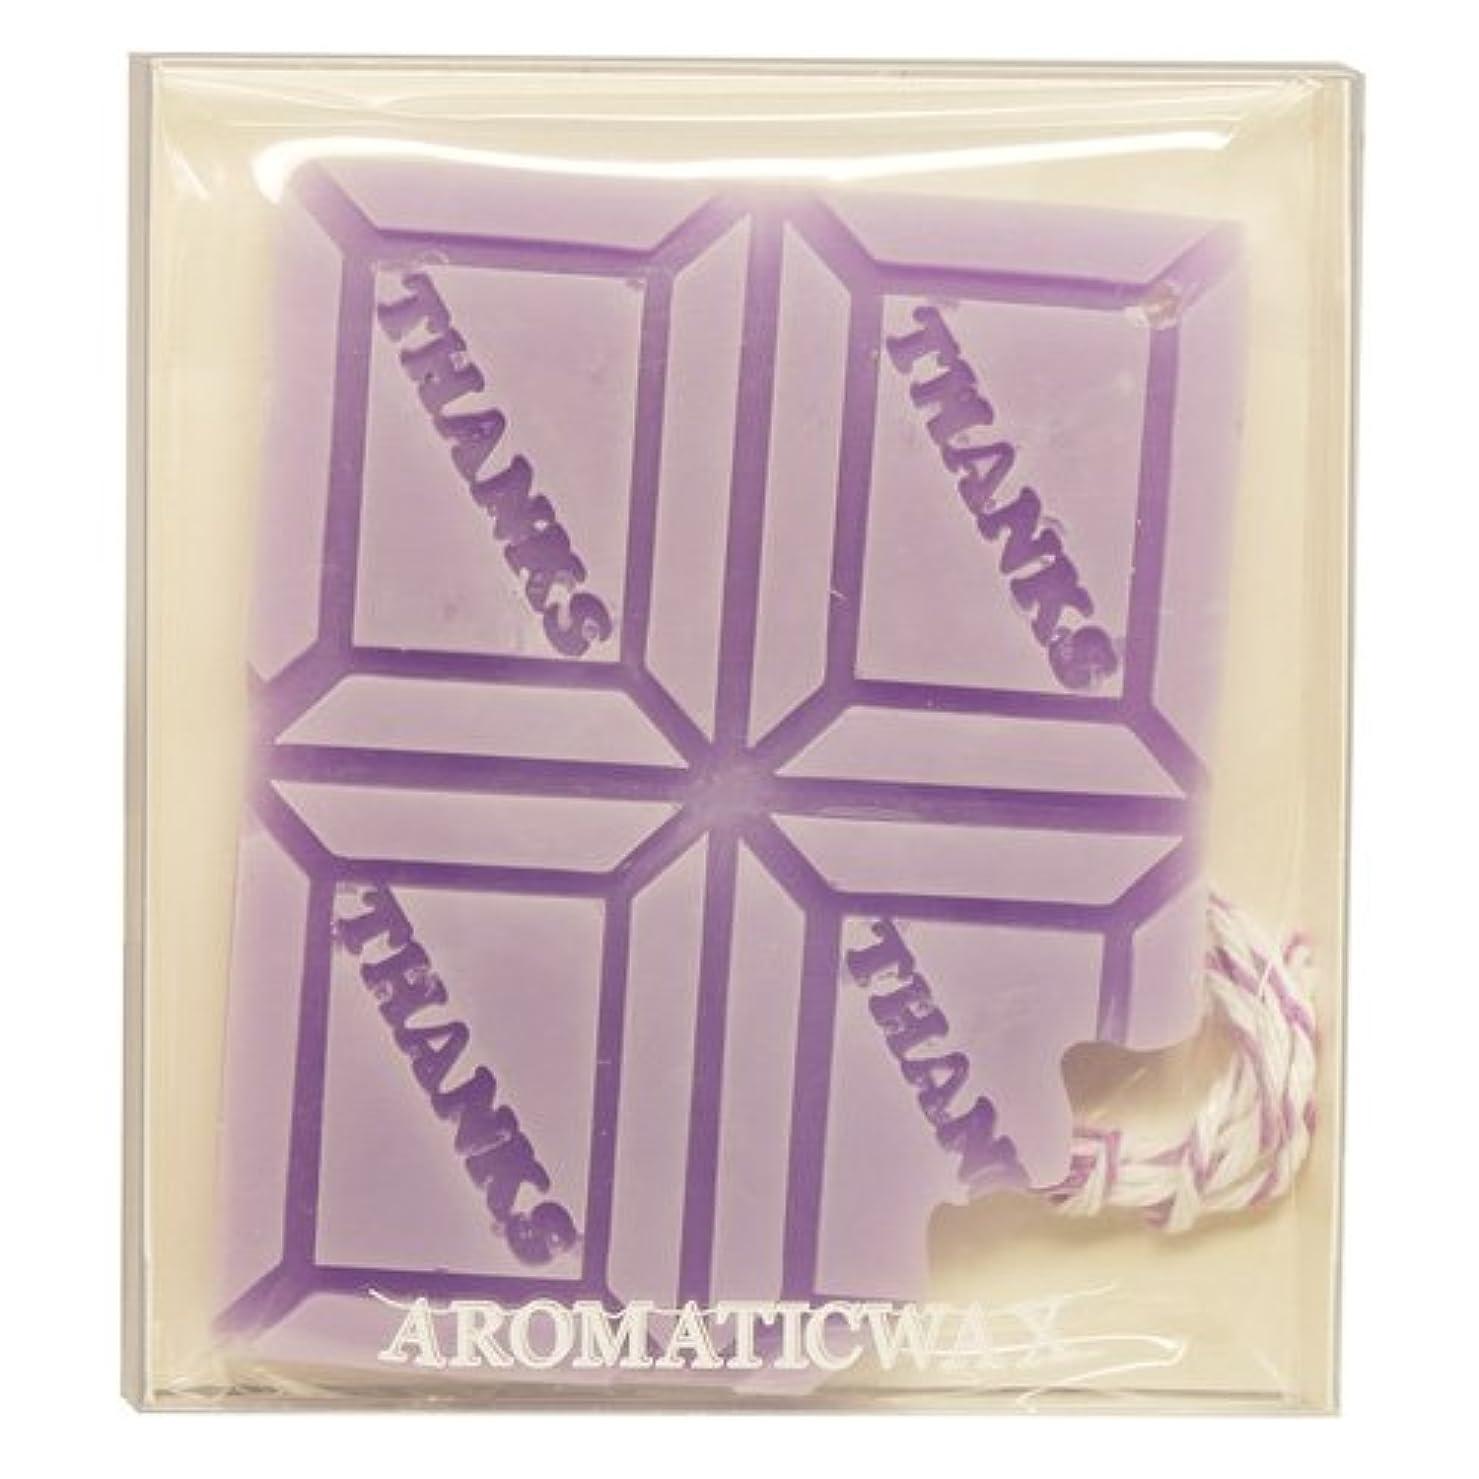 GRASSE TOKYO AROMATICWAXチャーム「板チョコ(THANKS)」(PU) ラベンダー アロマティックワックス グラーストウキョウ